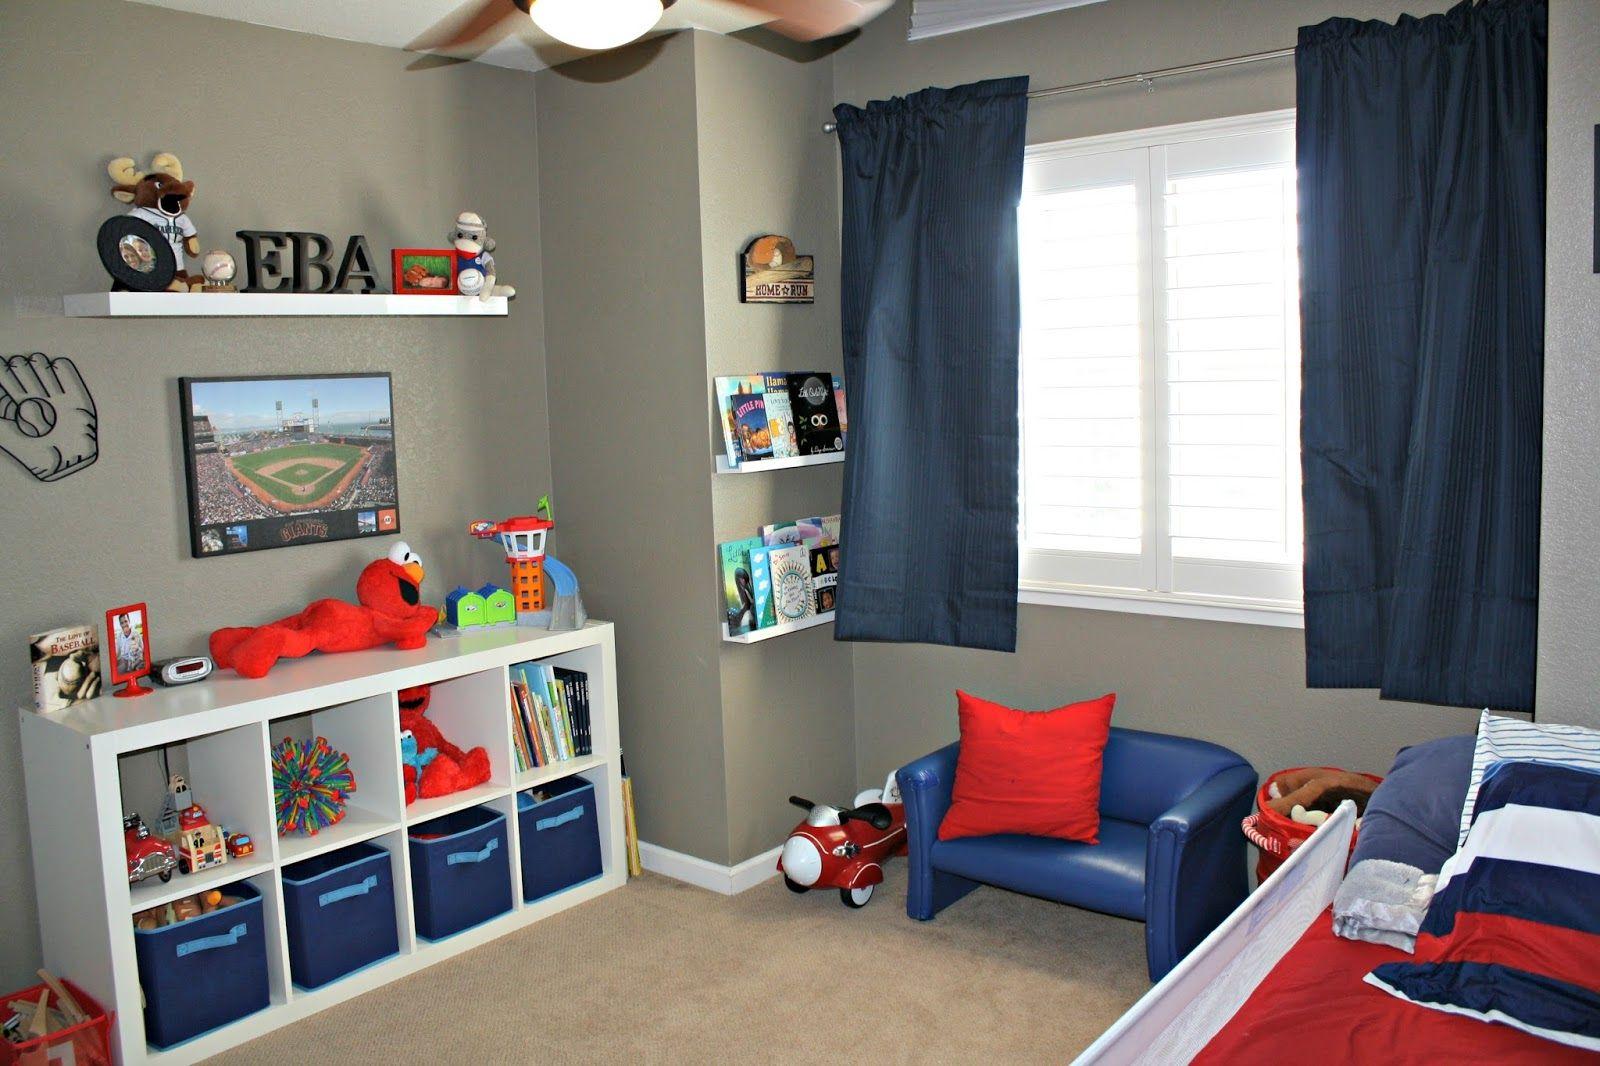 99 Decorating A Toddler Boy Room Low Budget Bedroom Decorating